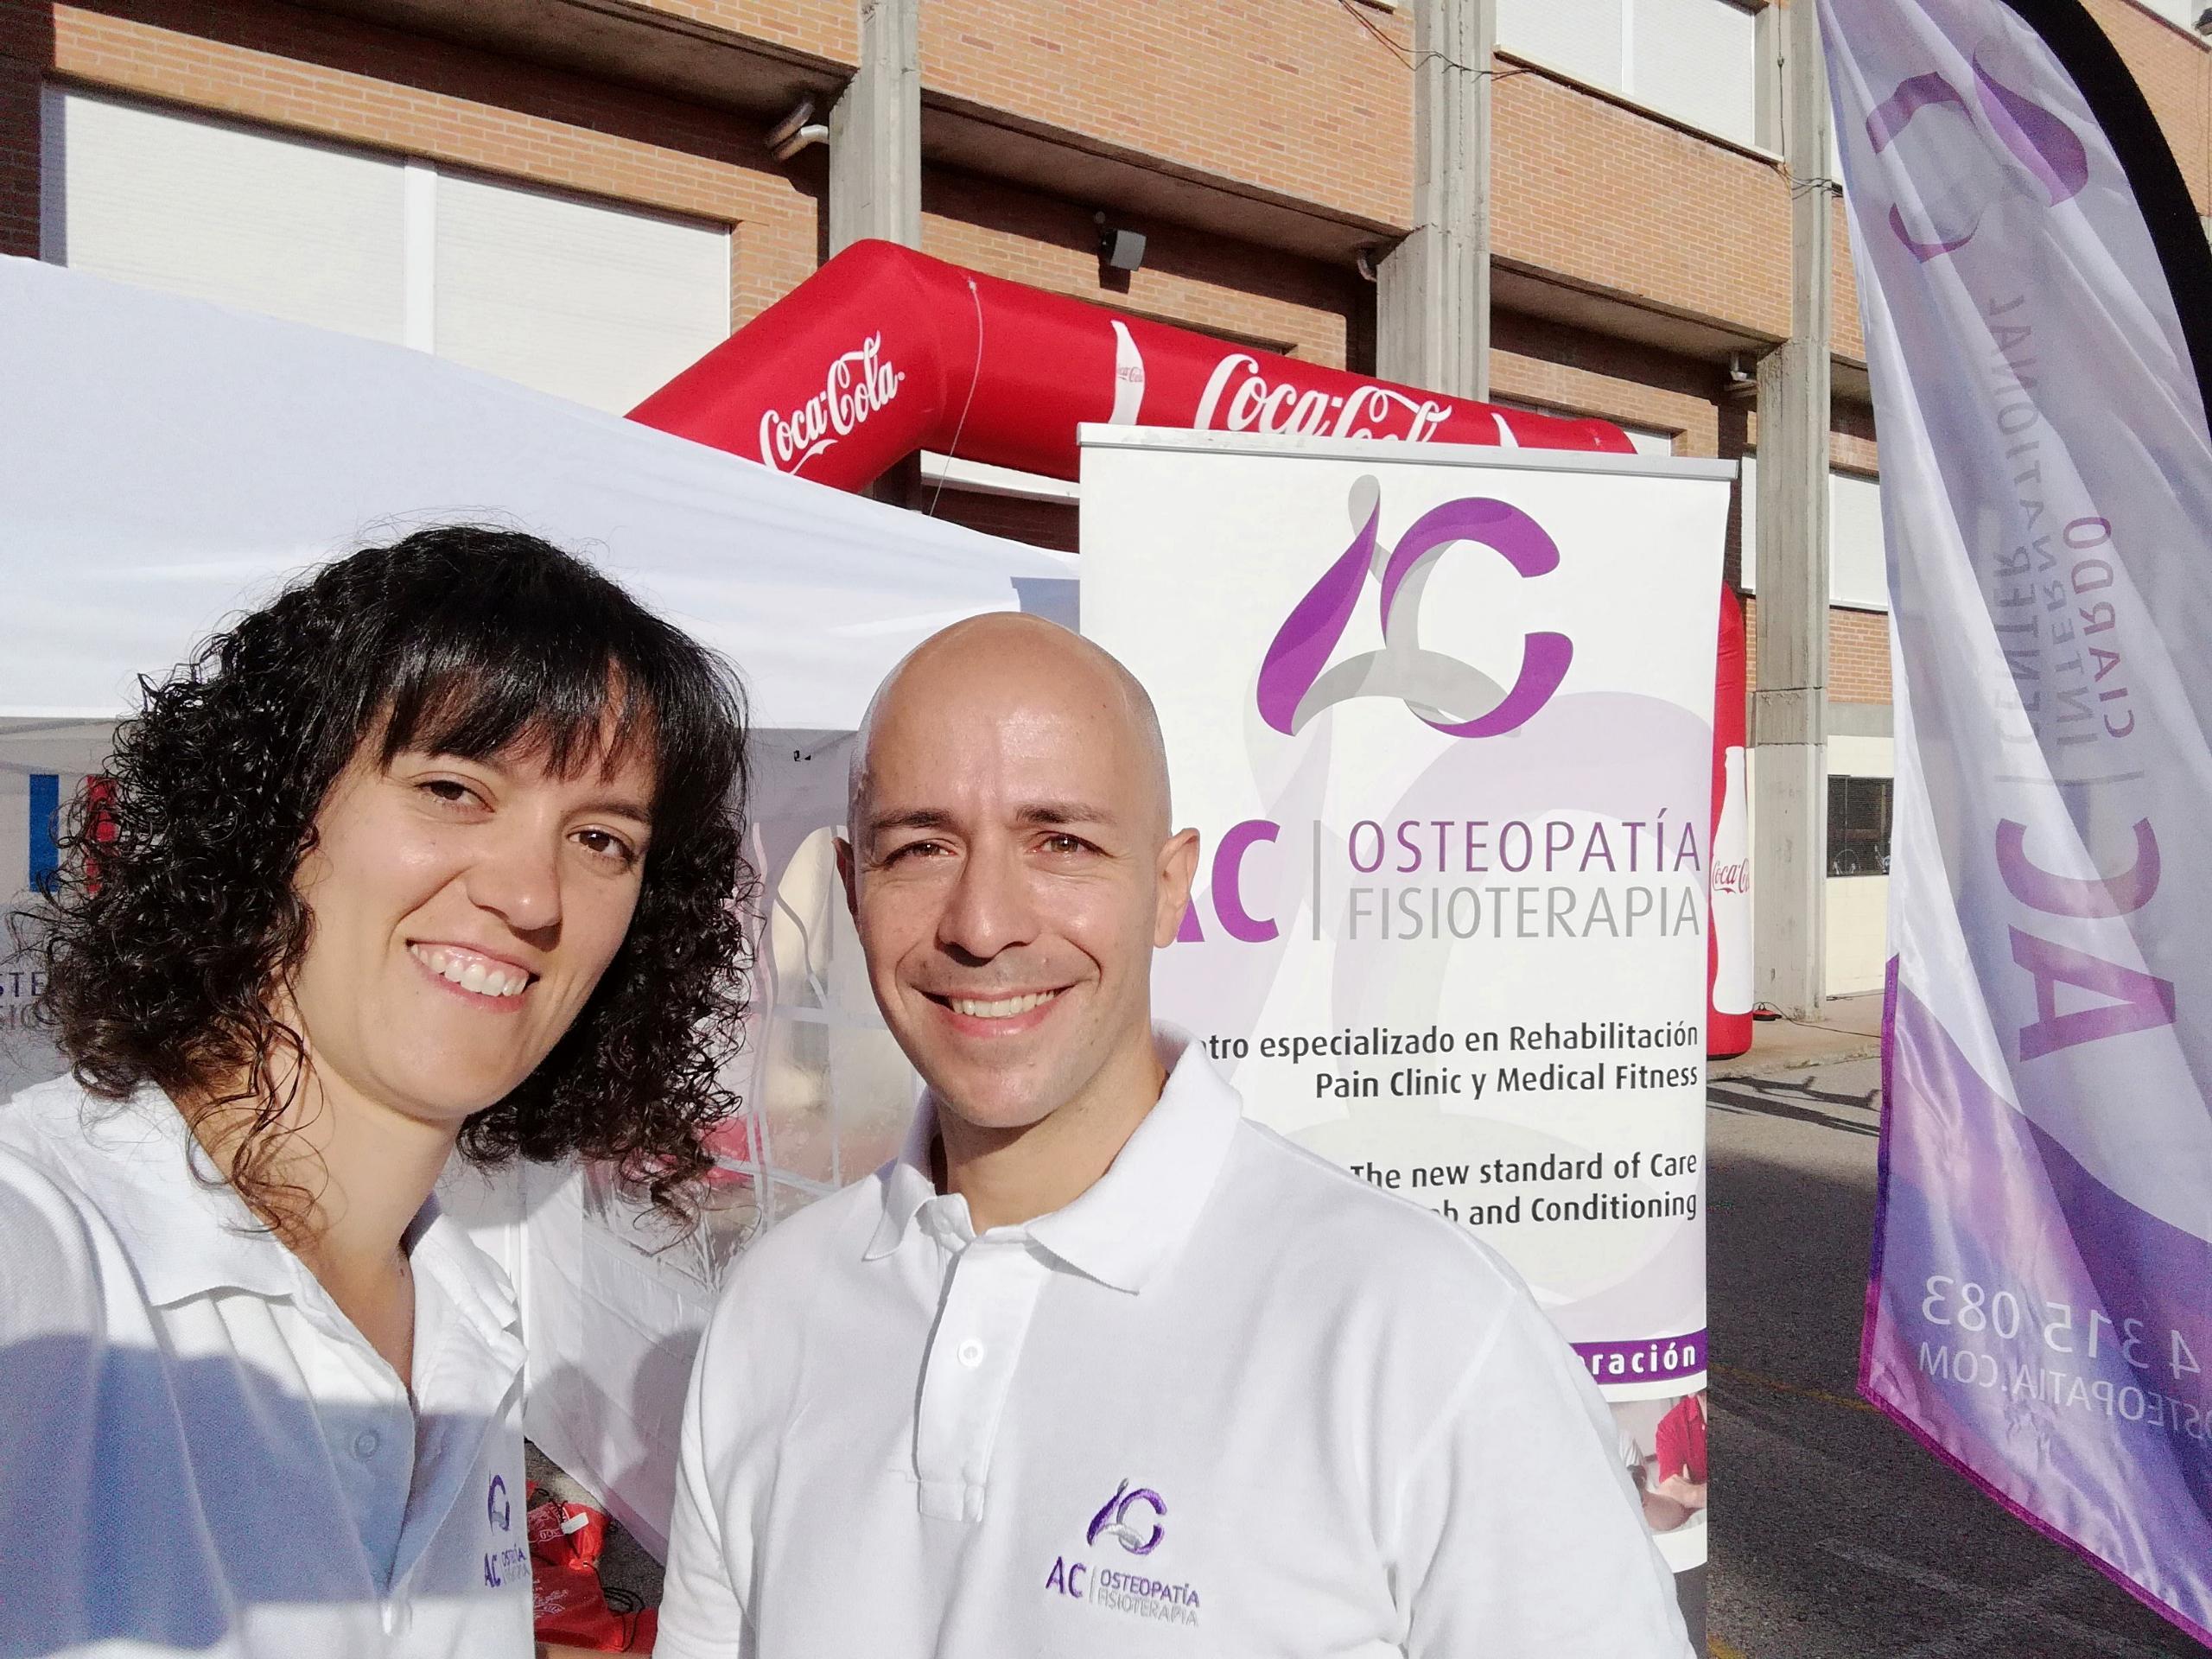 Carrera Madrid Segovia De 100 Km Ac Osteopatia Fisioterapia